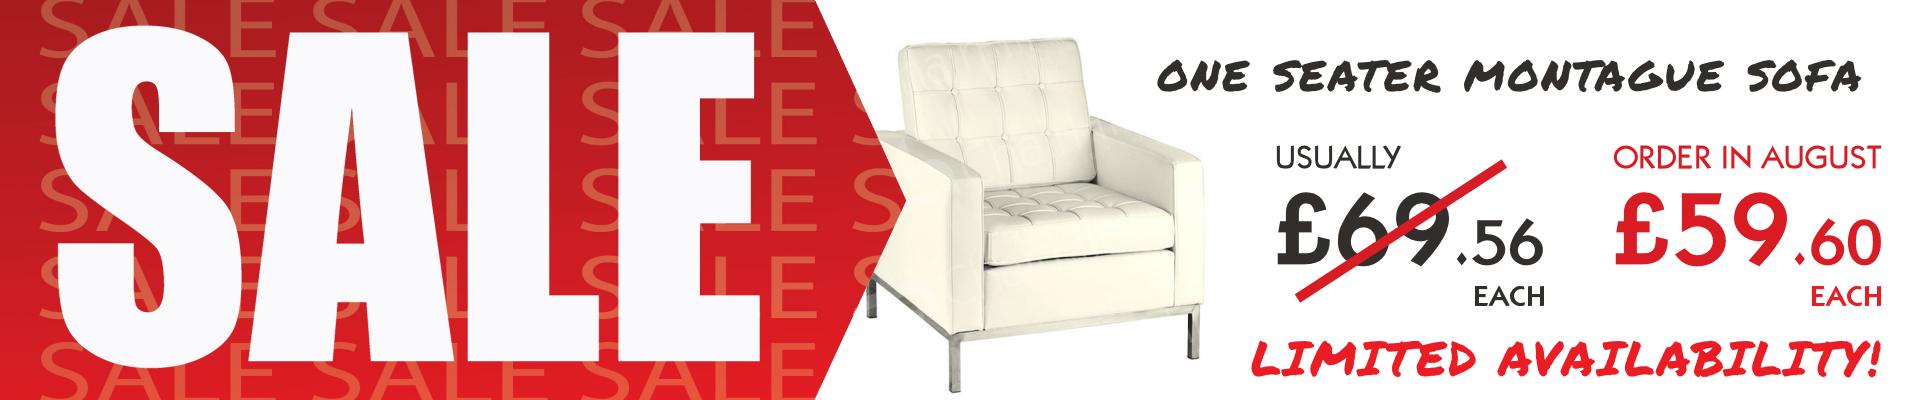 One Seater Cream Montague Sofa Sale